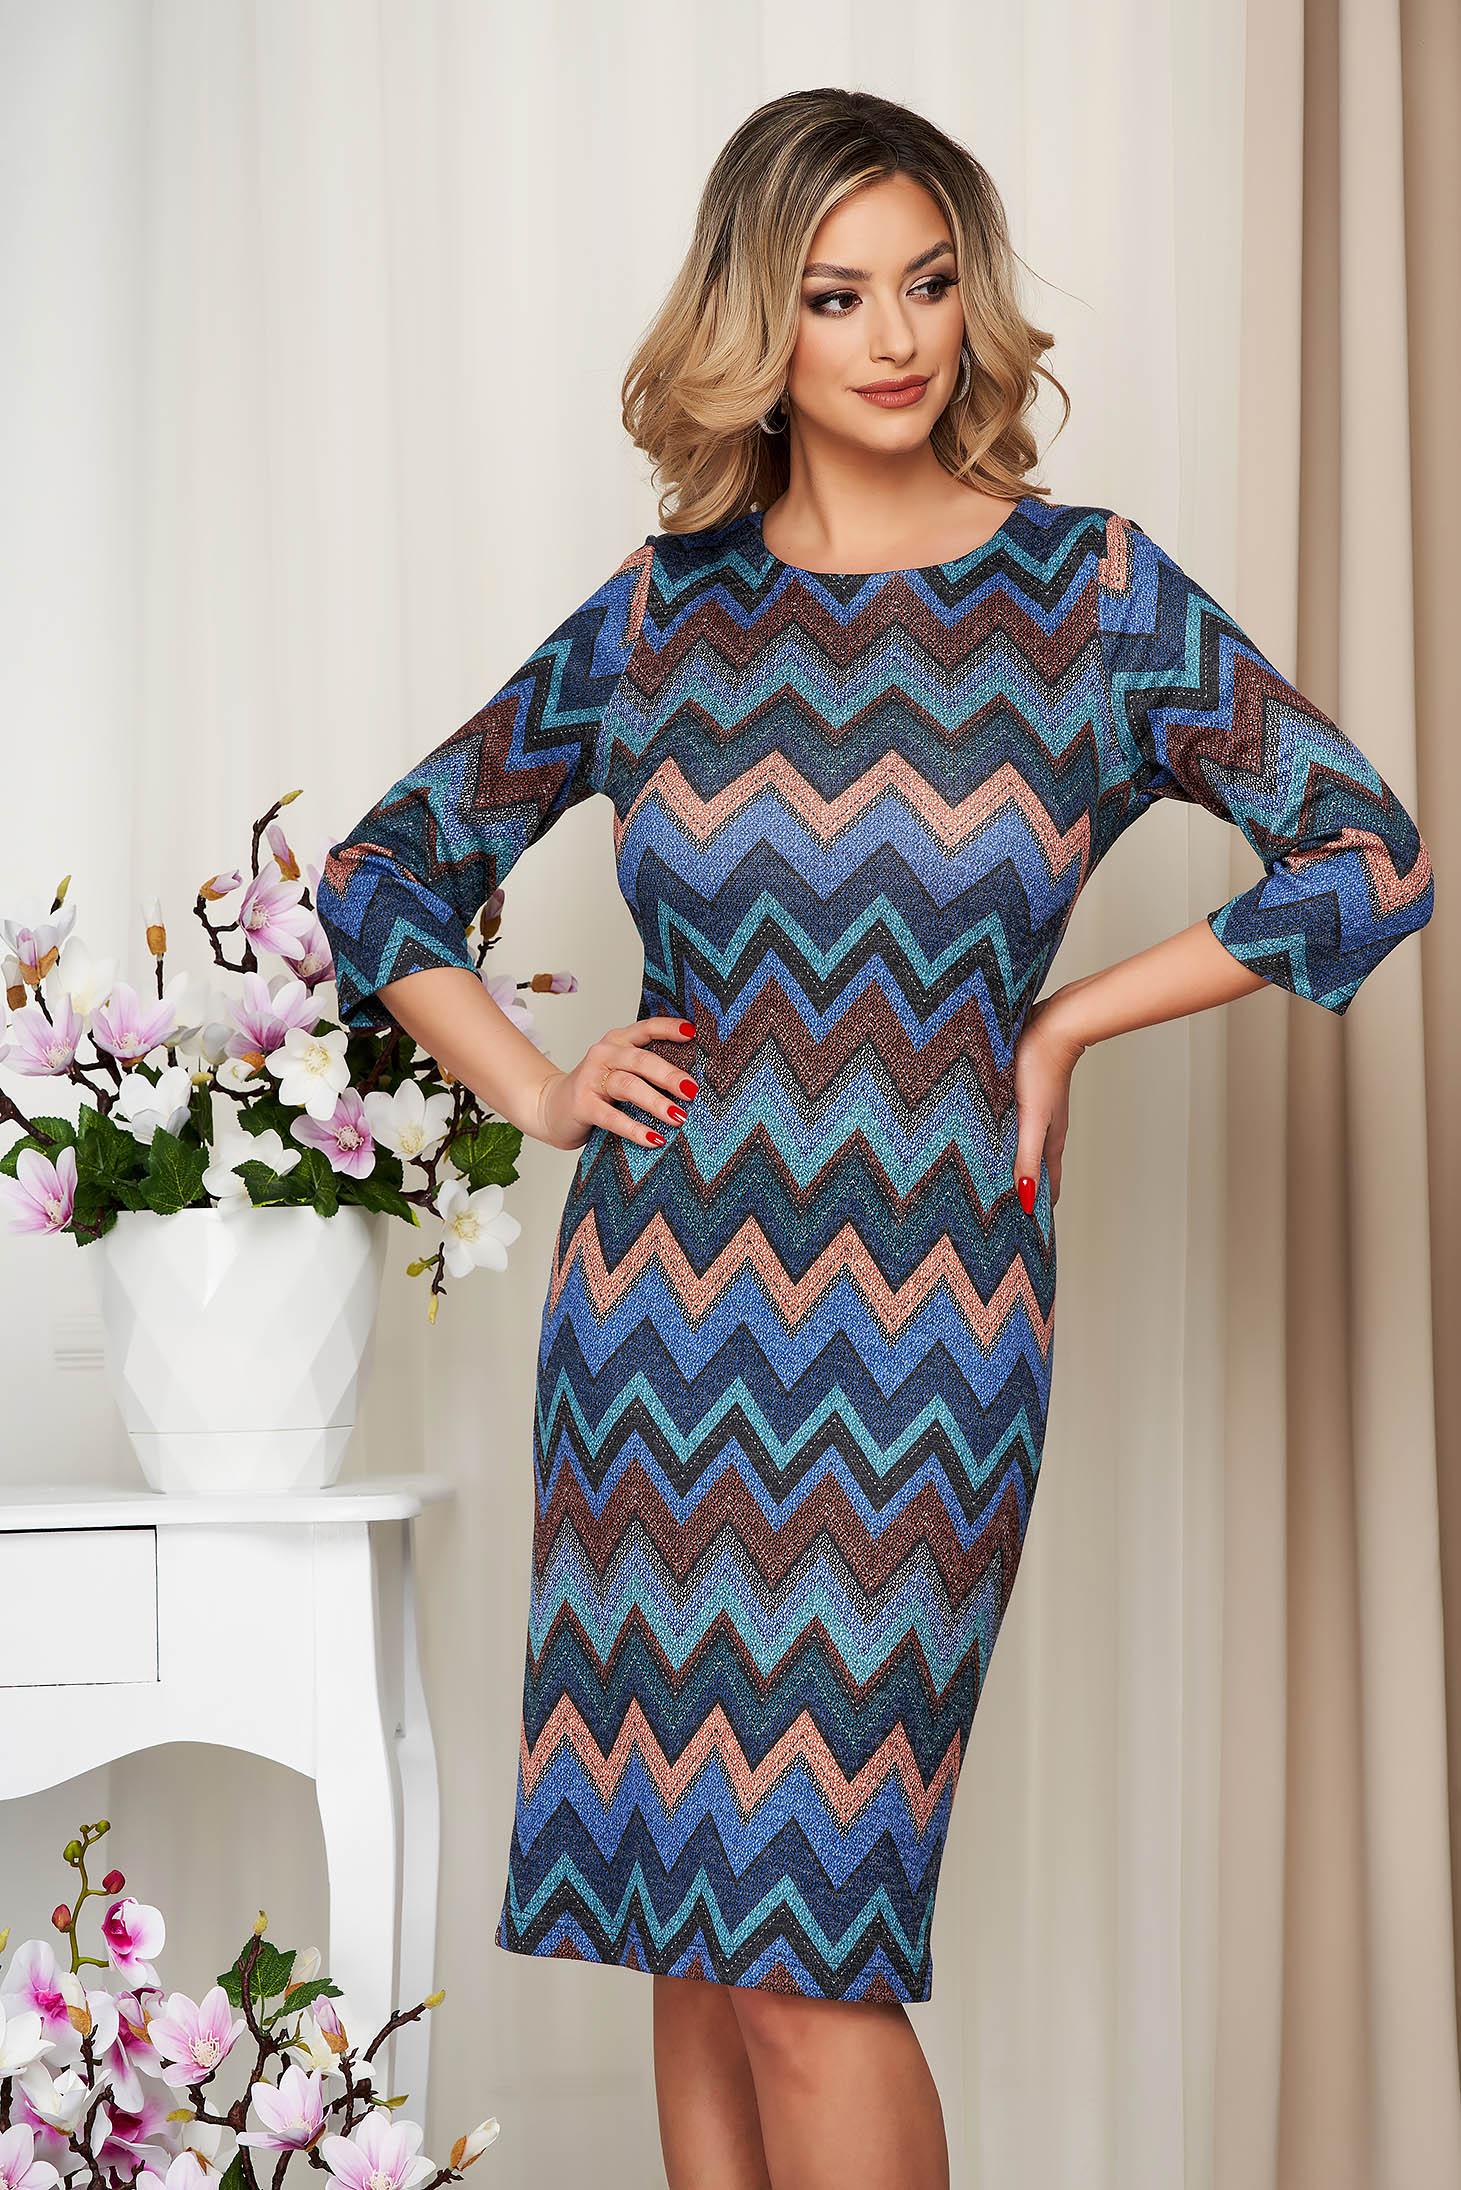 Blue dress midi pencil knitted fabric